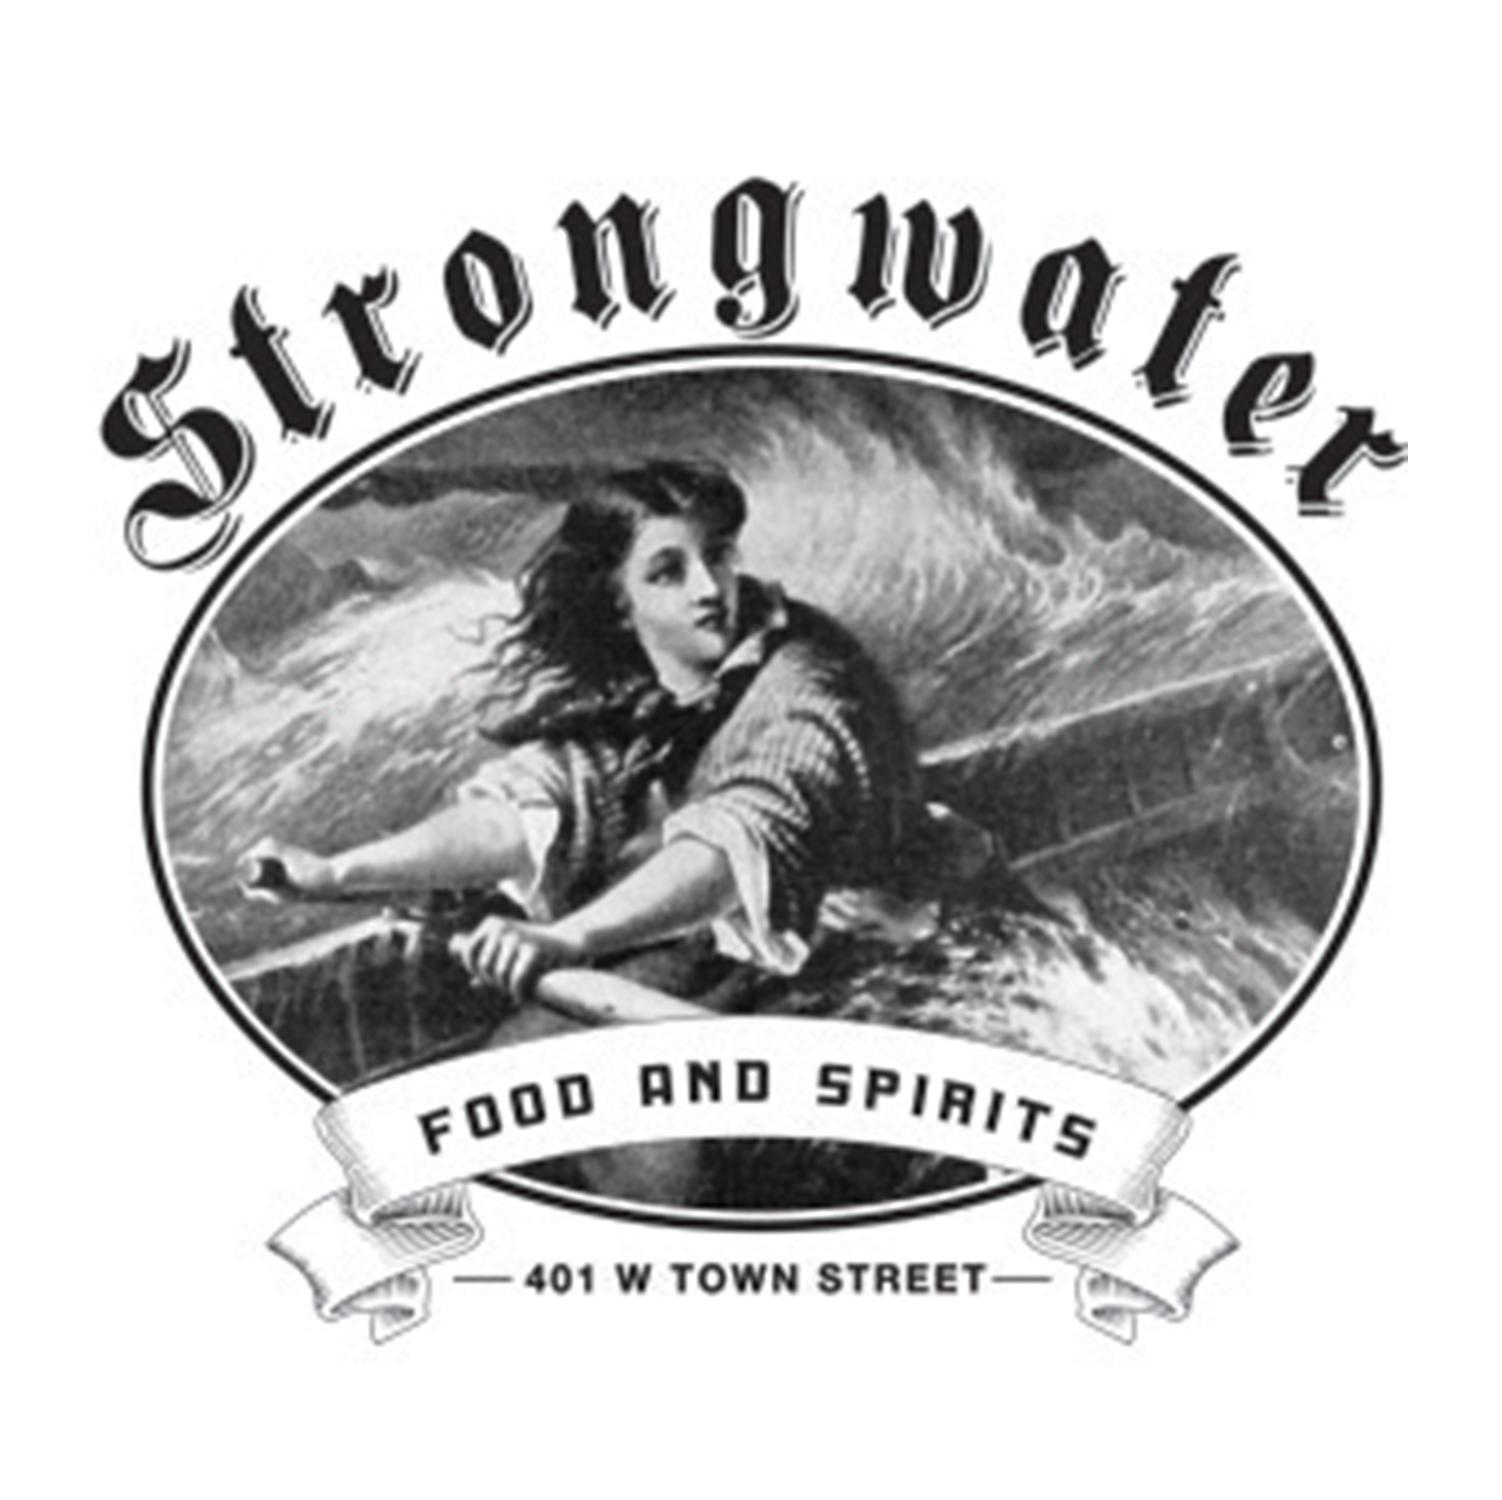 STRONGWATER FOOD & SPIRITS